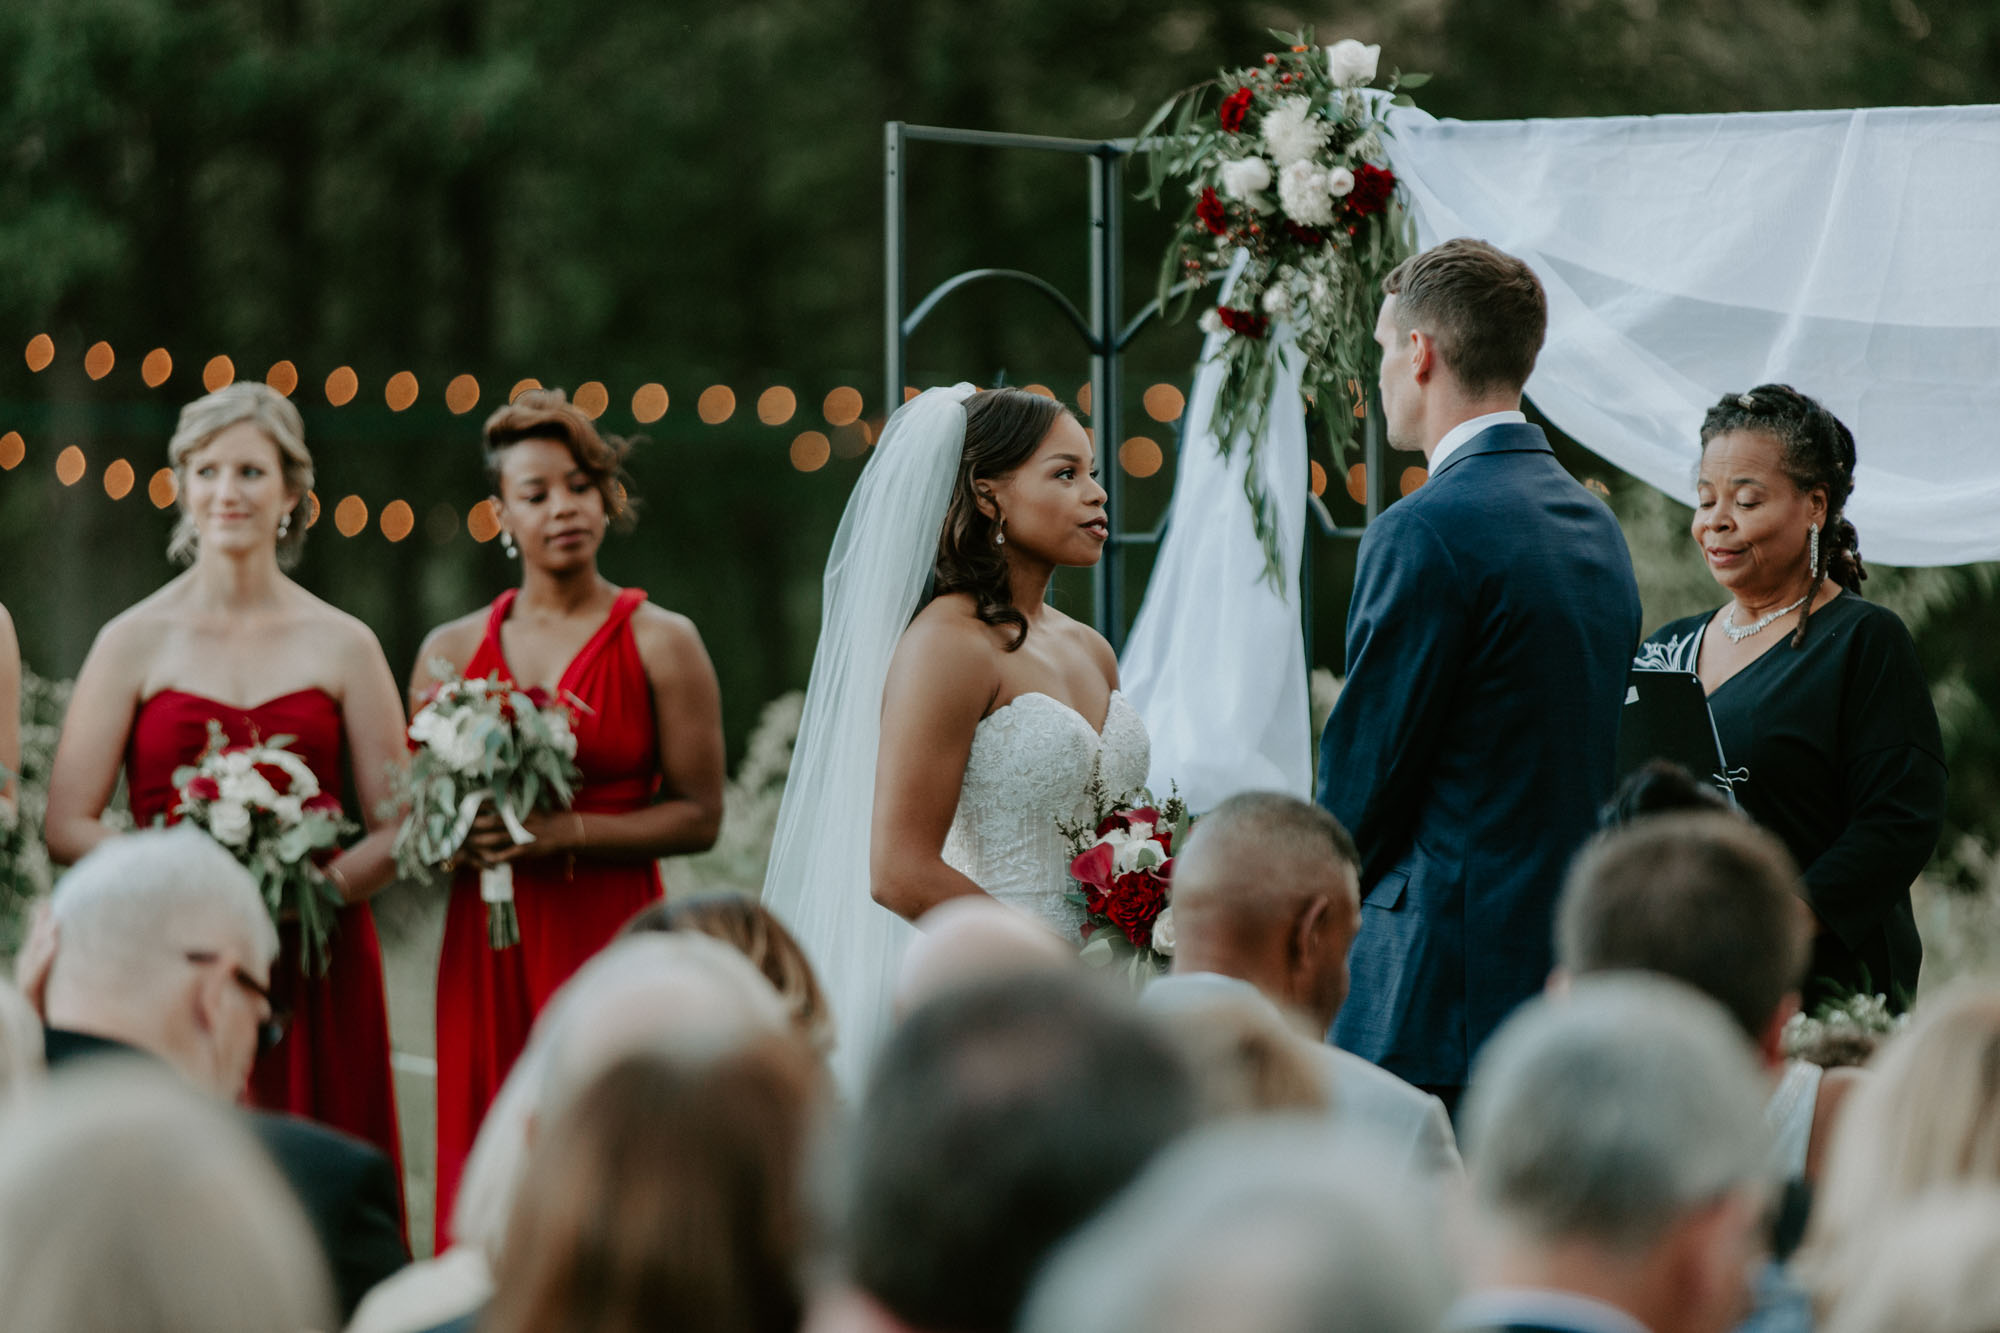 prairie_glass_house_wedding_champaign_wright_photographs_simon_0084.jpg